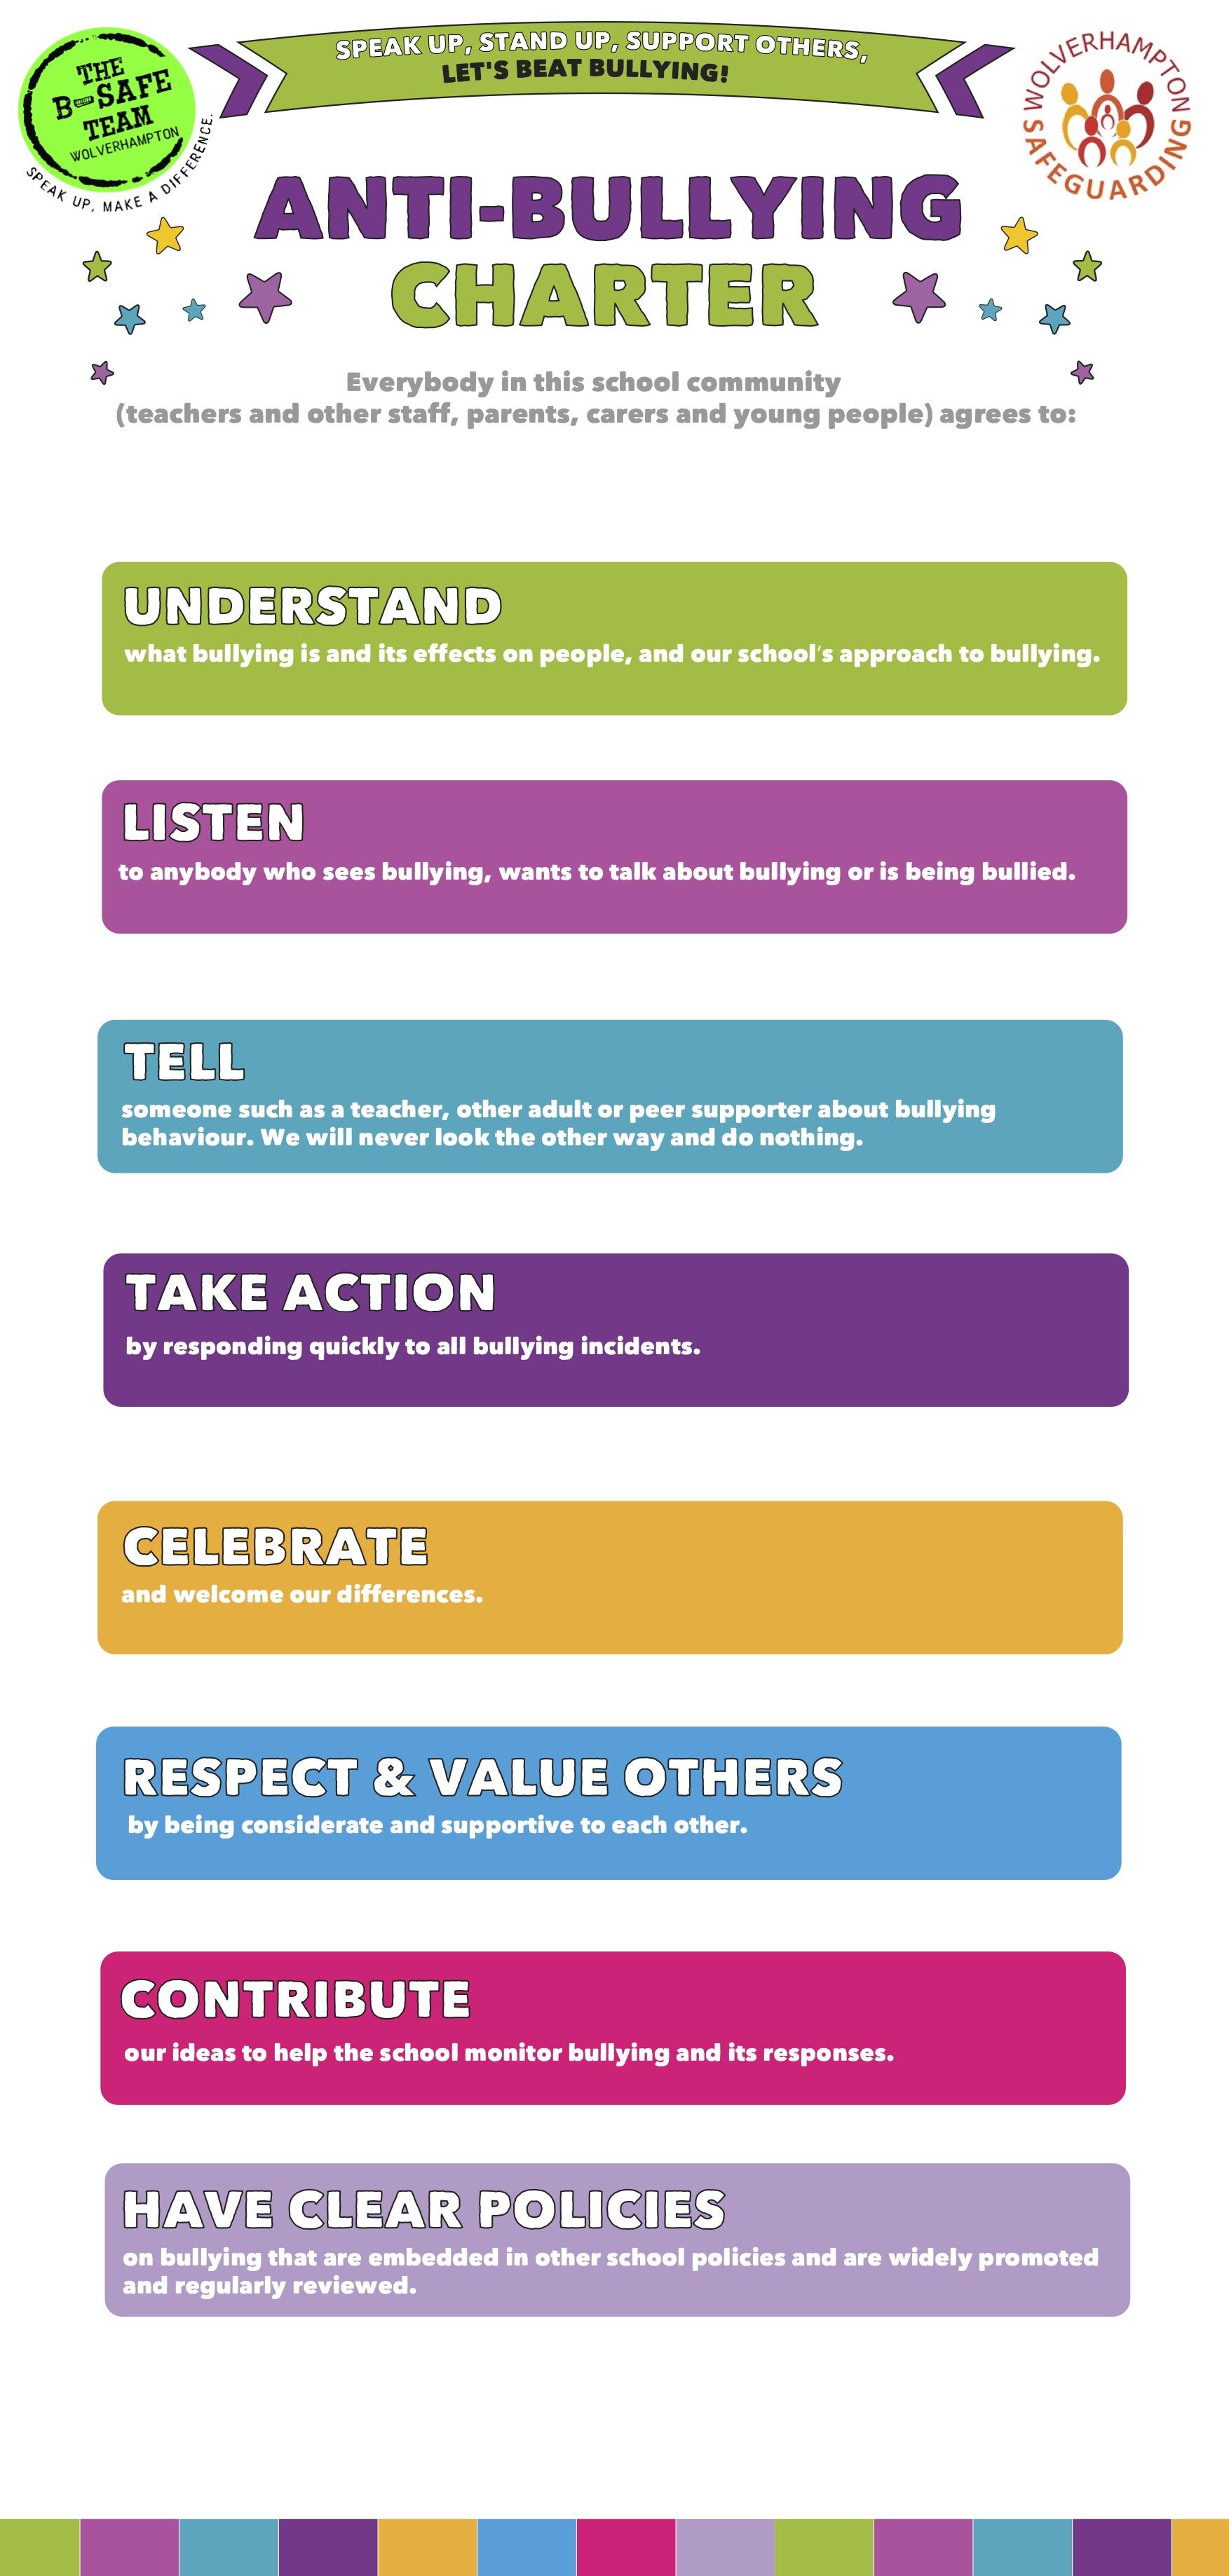 NEWSecondary Anti-Bullying Charter.jpg